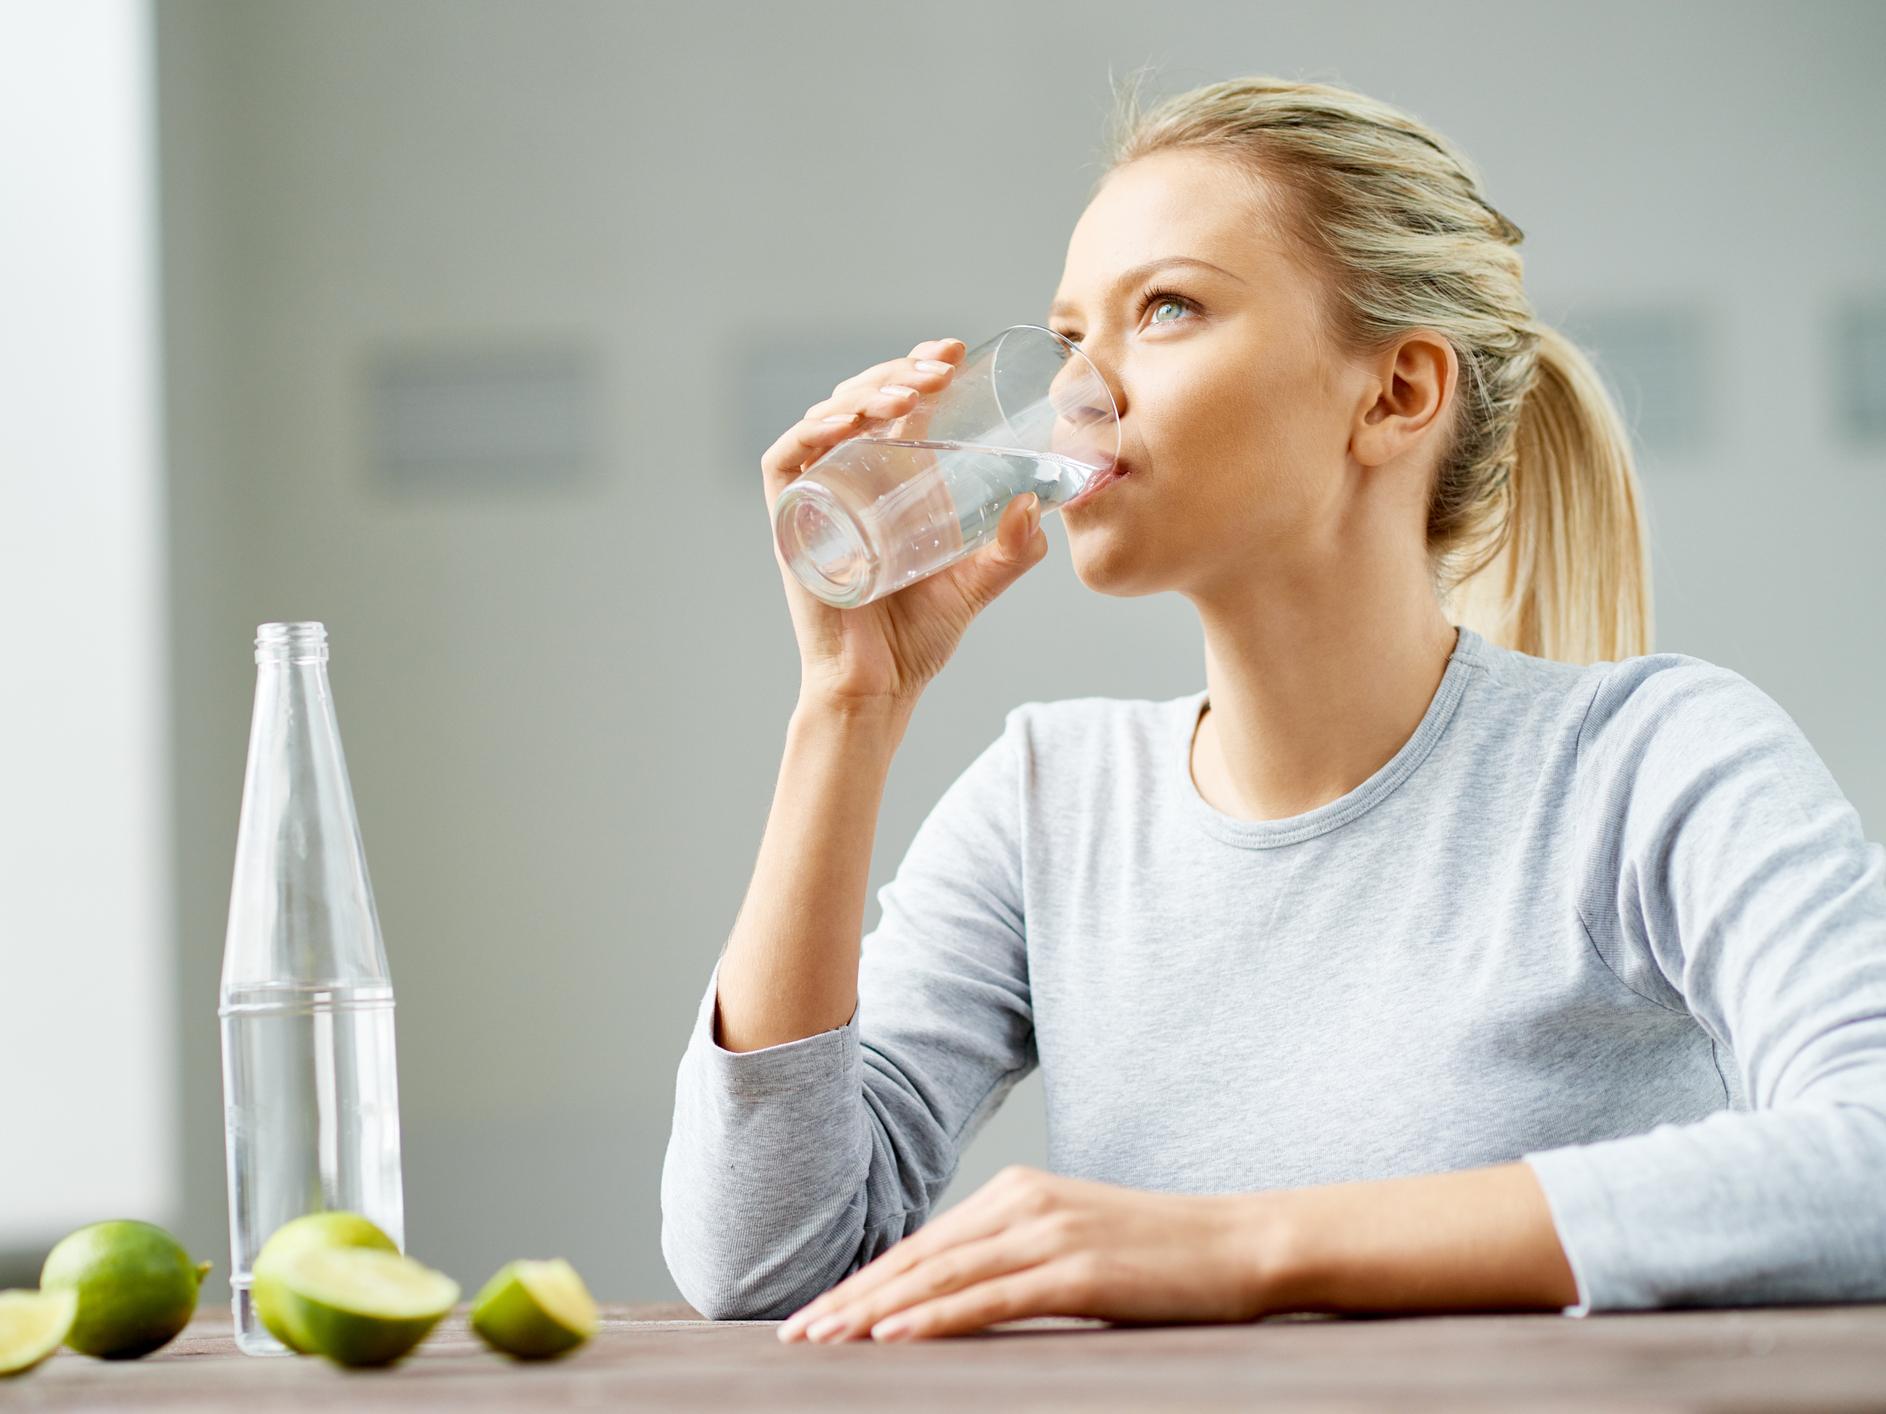 PunjabKesari, Nari, Drnking Water, Images